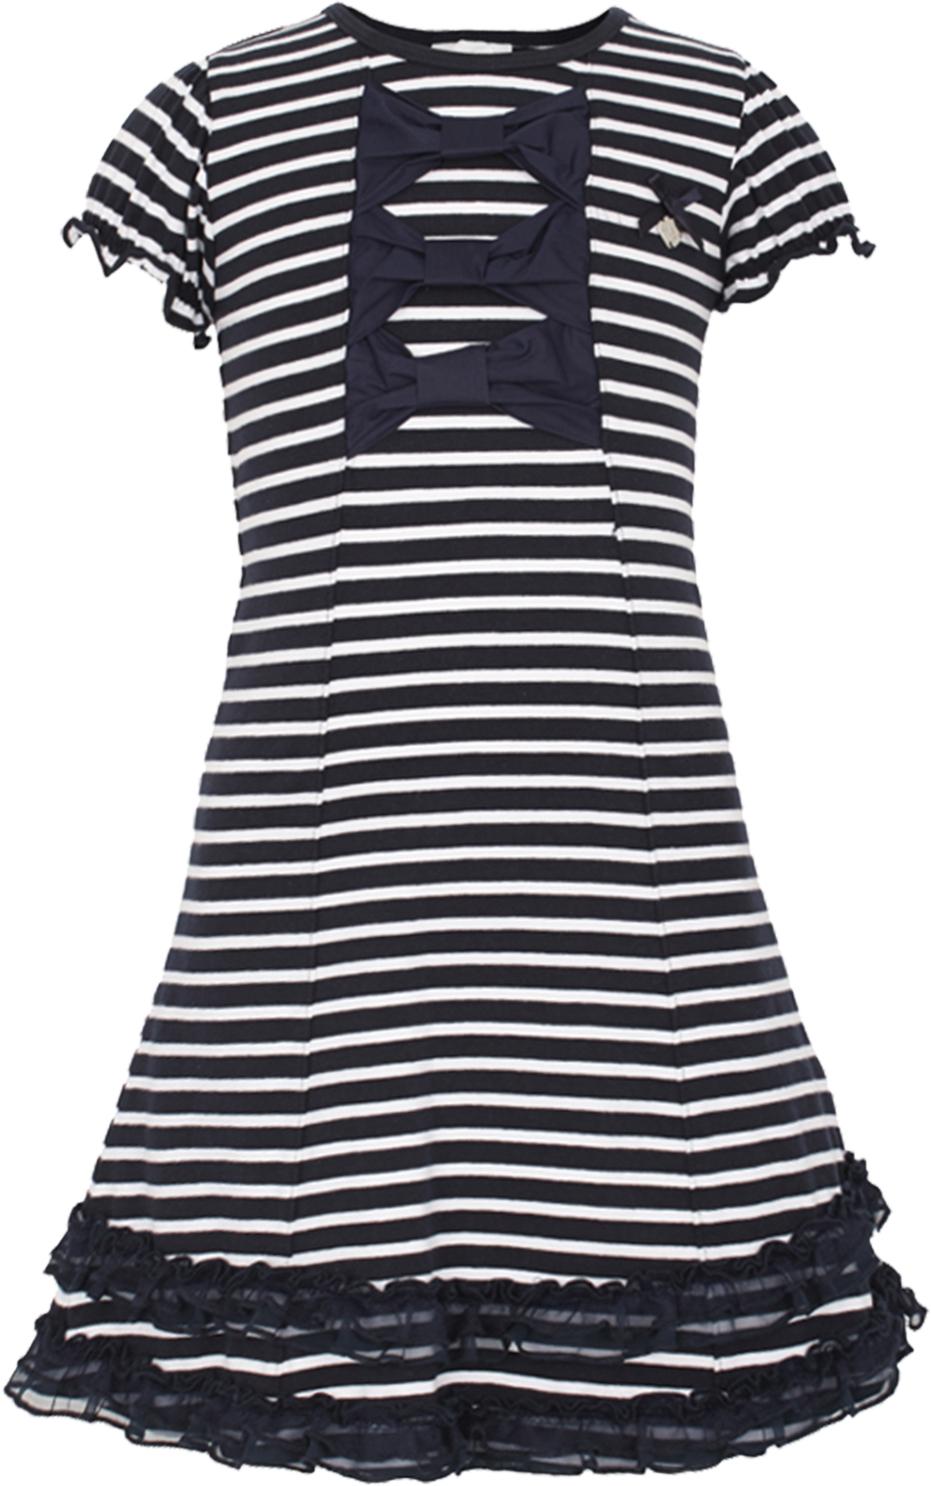 Le chic navy blue stripe dress y1500 106475 1